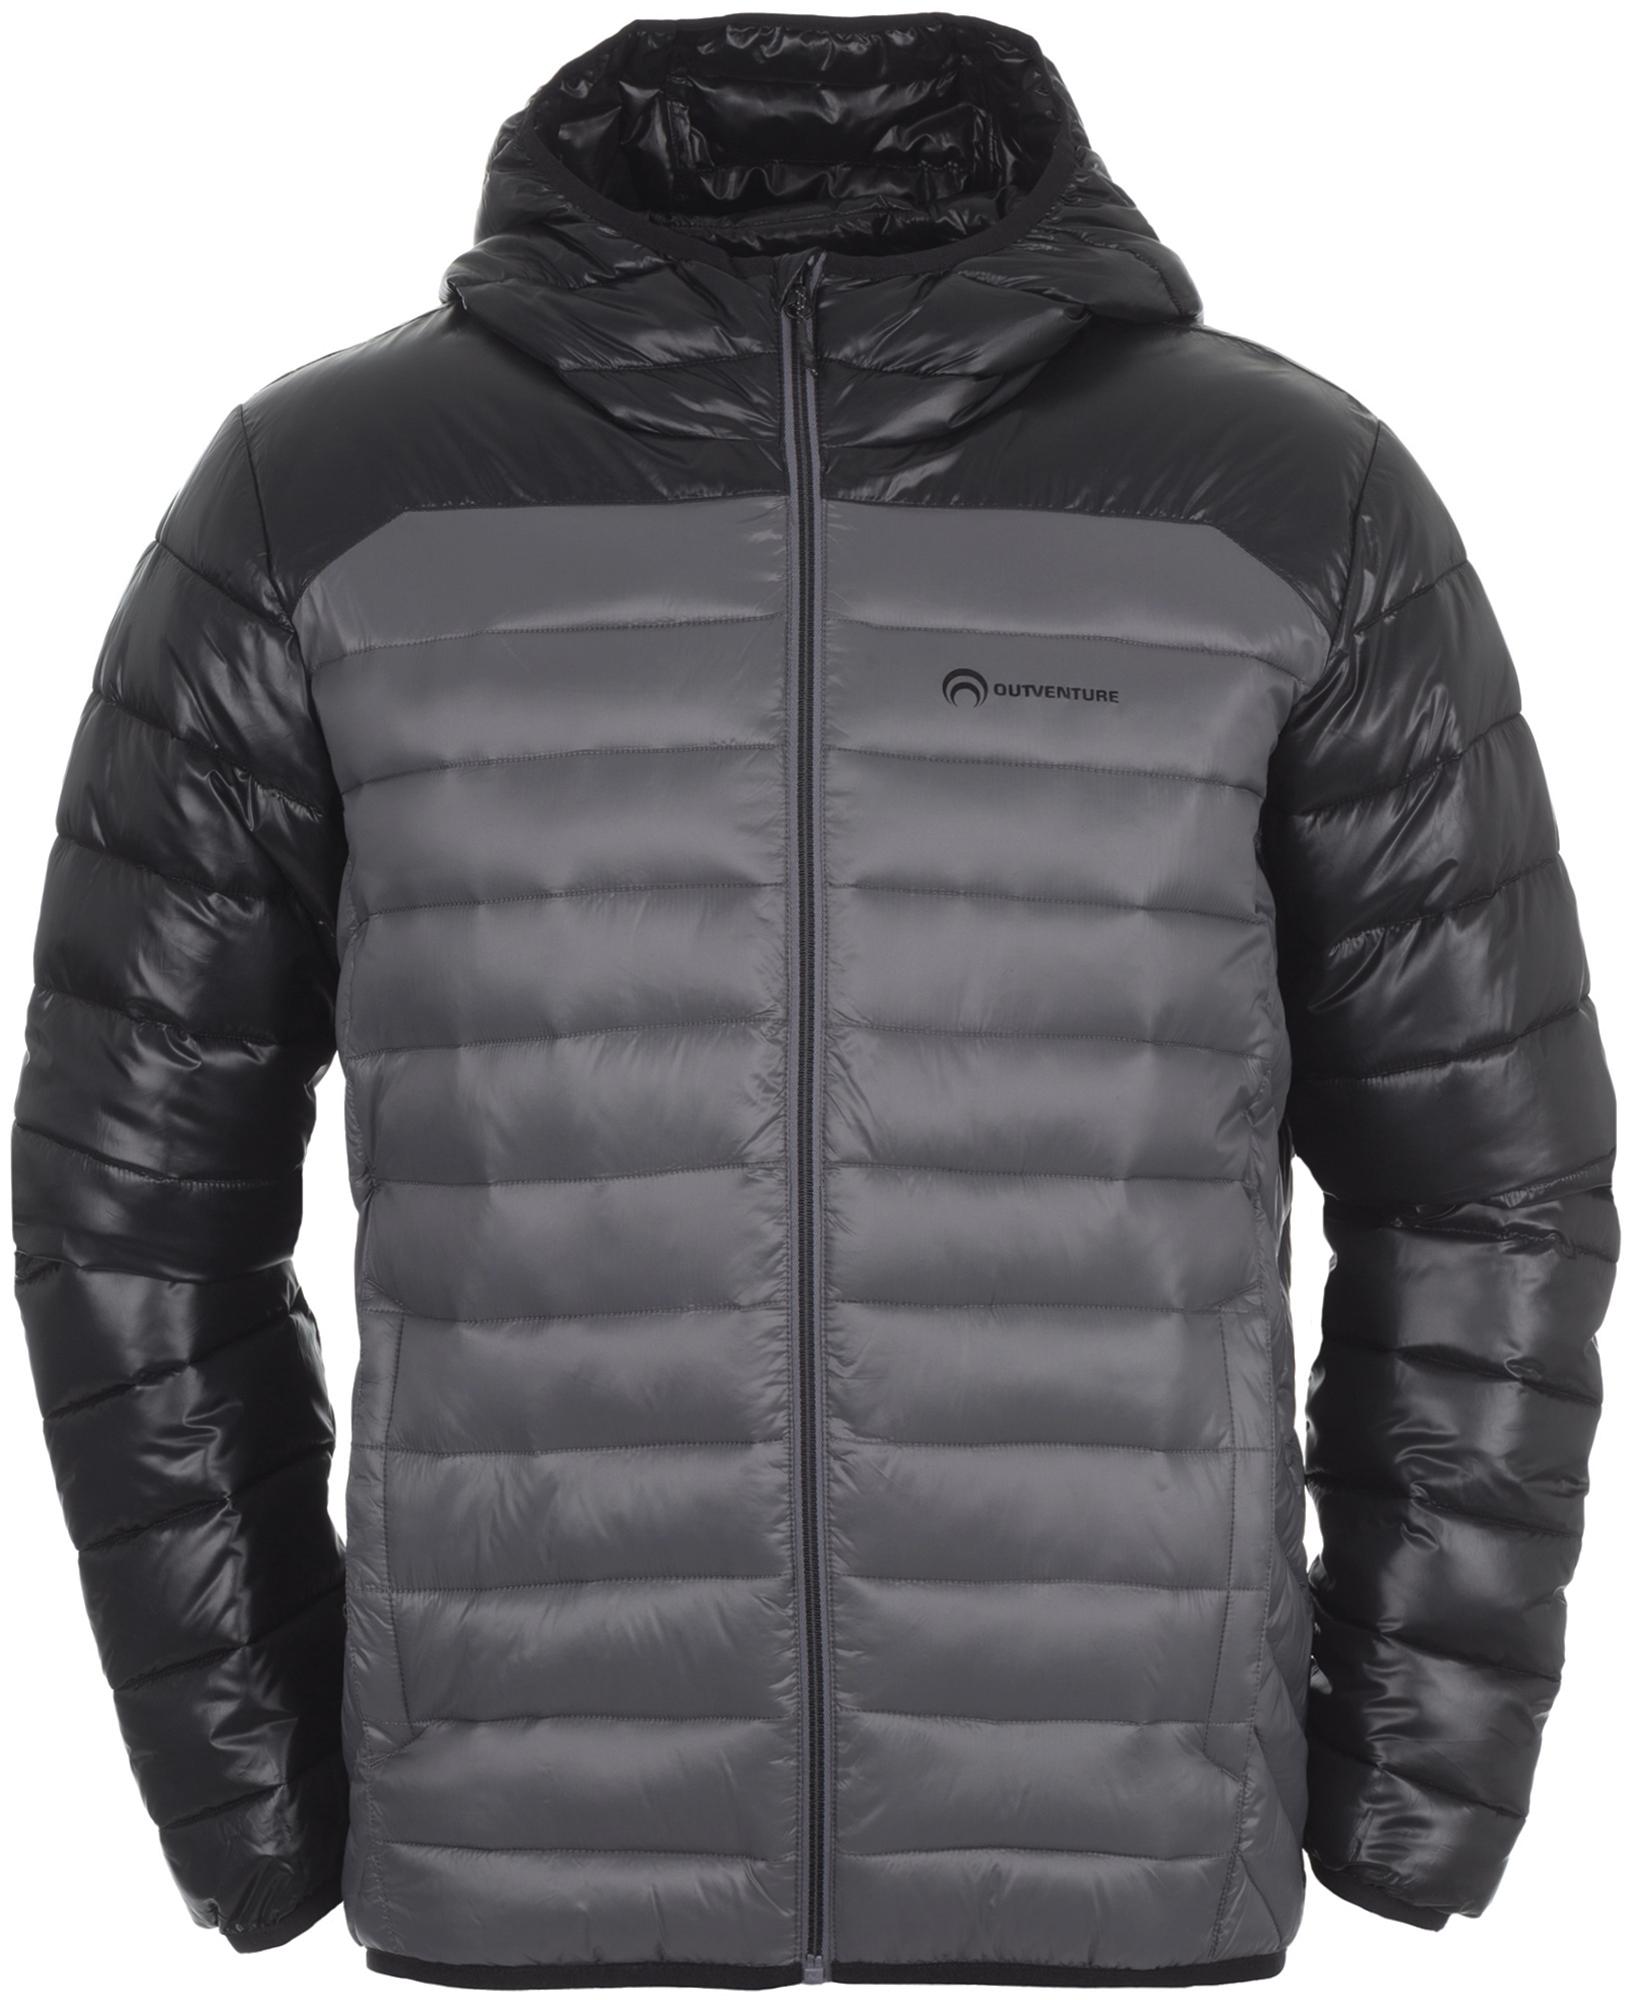 Outventure Куртка утепленная мужская Outventure outventure куртка 3 в 1 мужская outventure